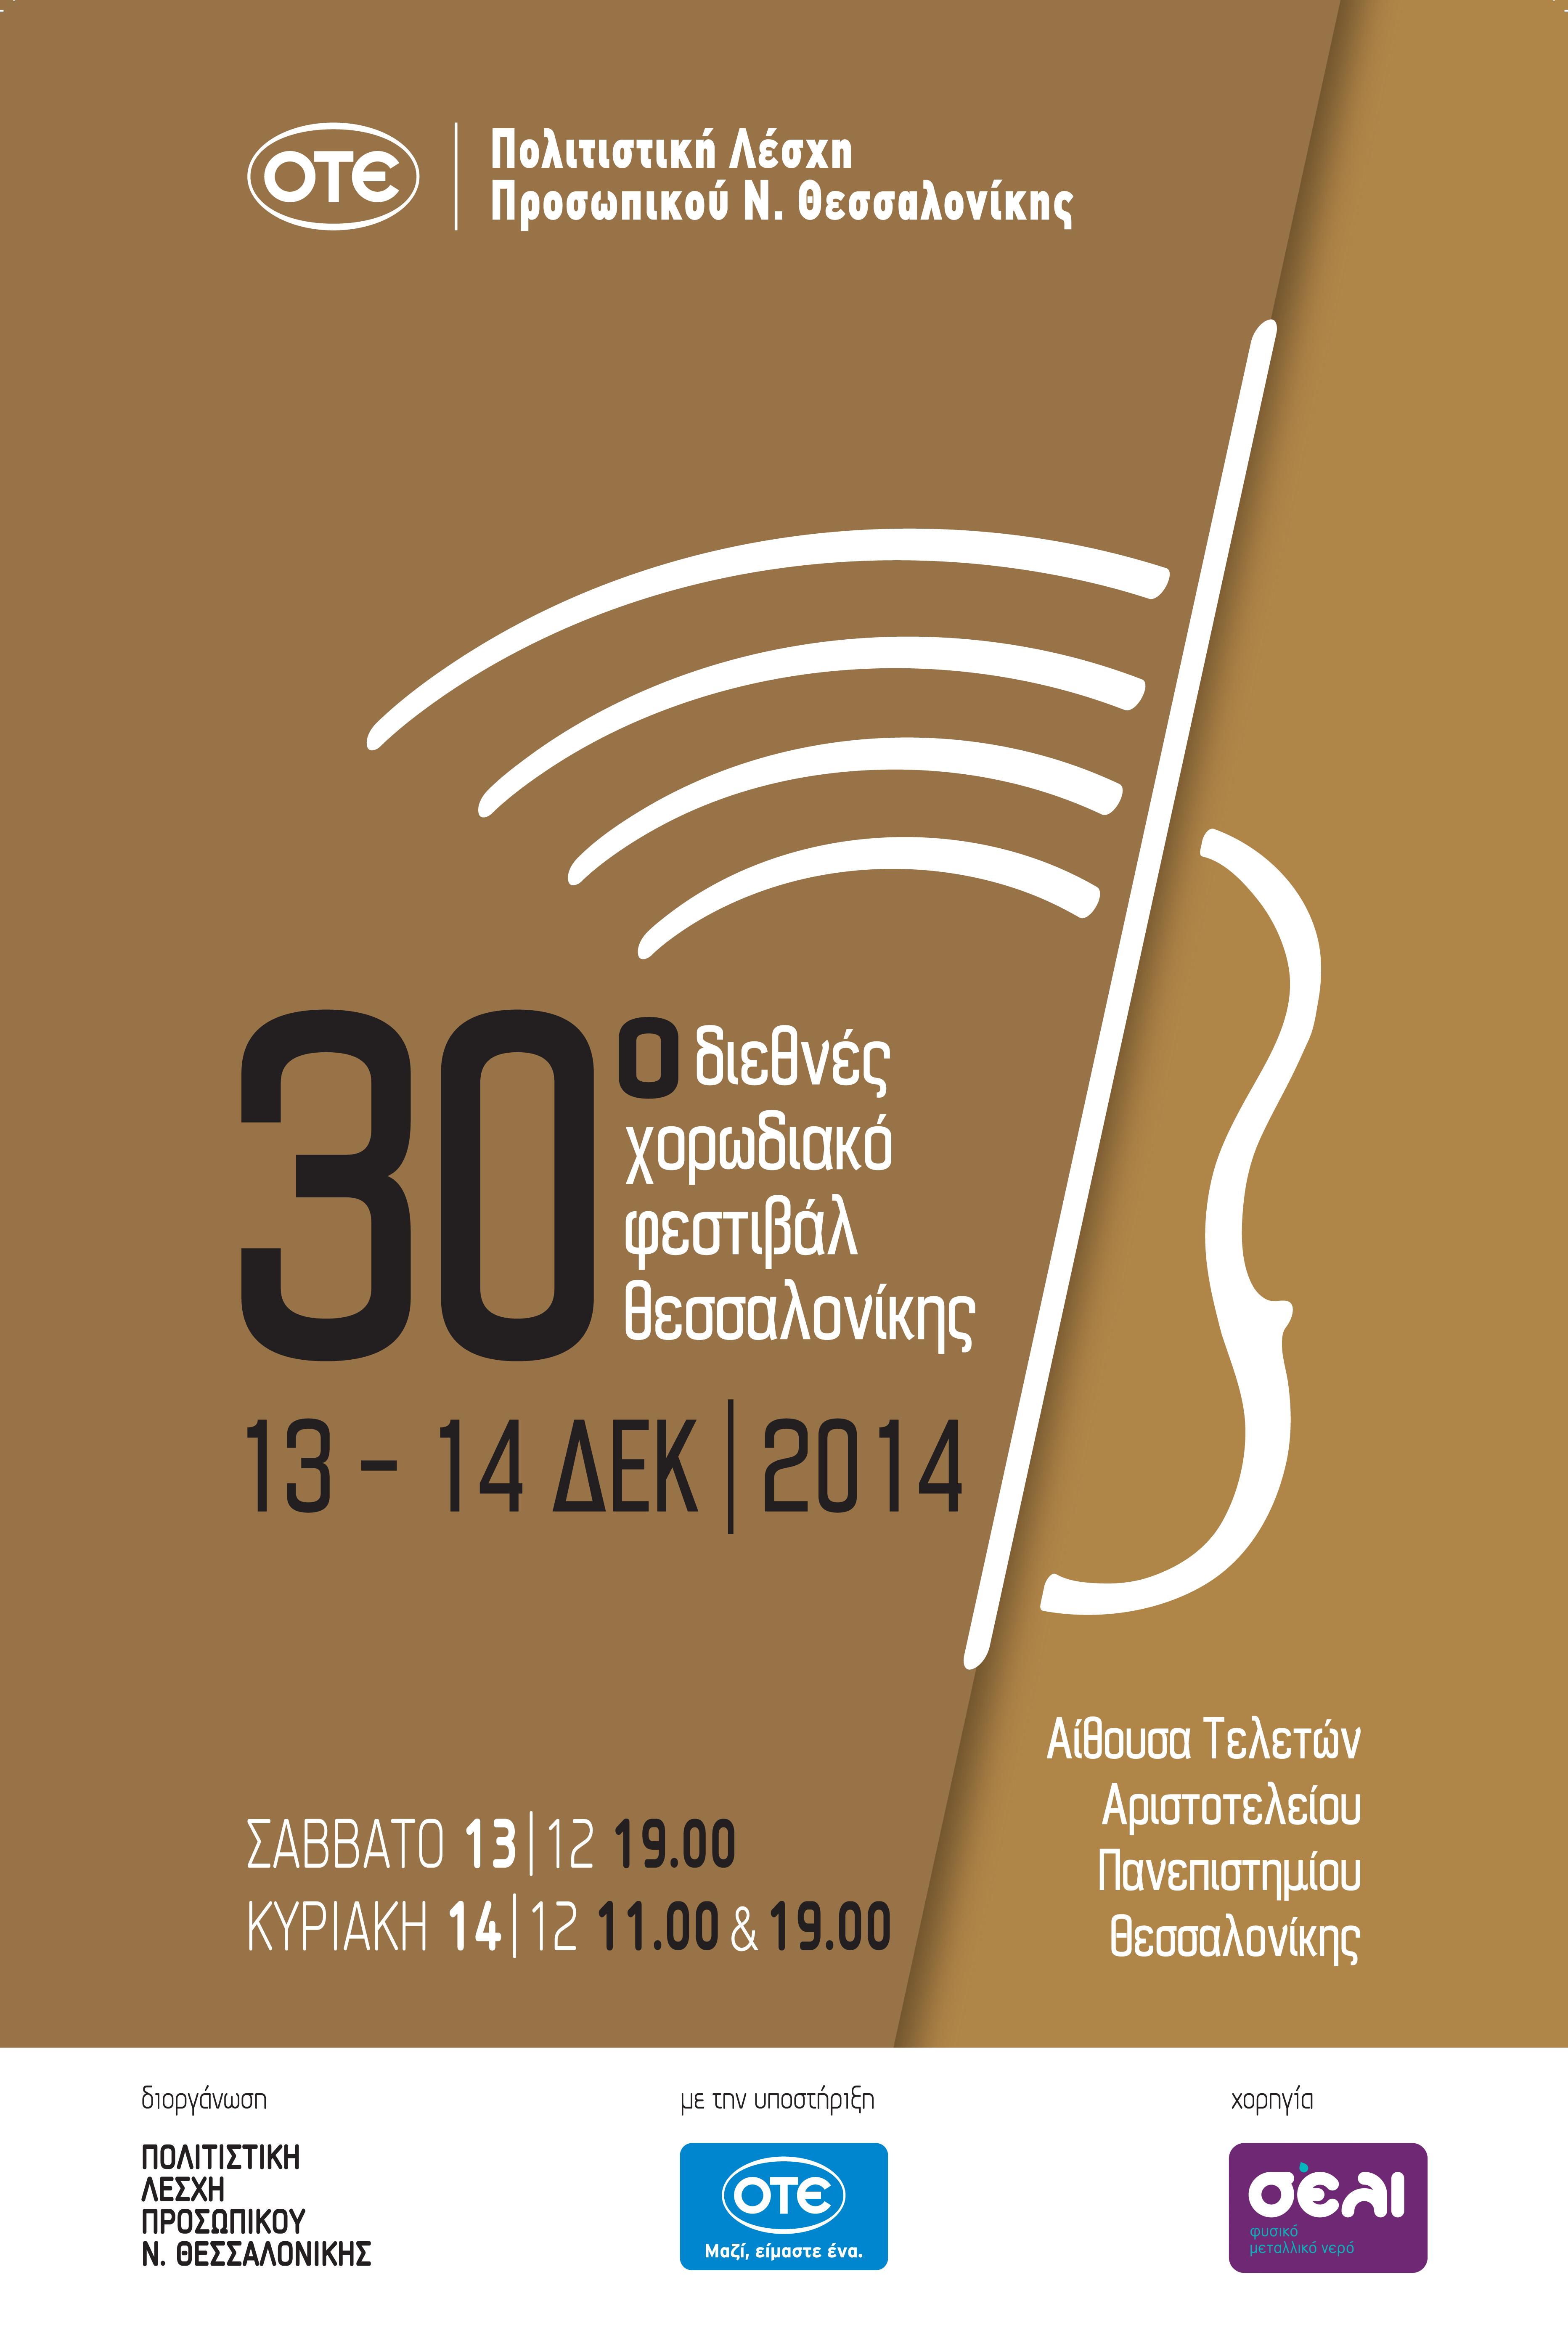 30oΔιεθνες χορωδιακο Φεστιβαλ Αφισα